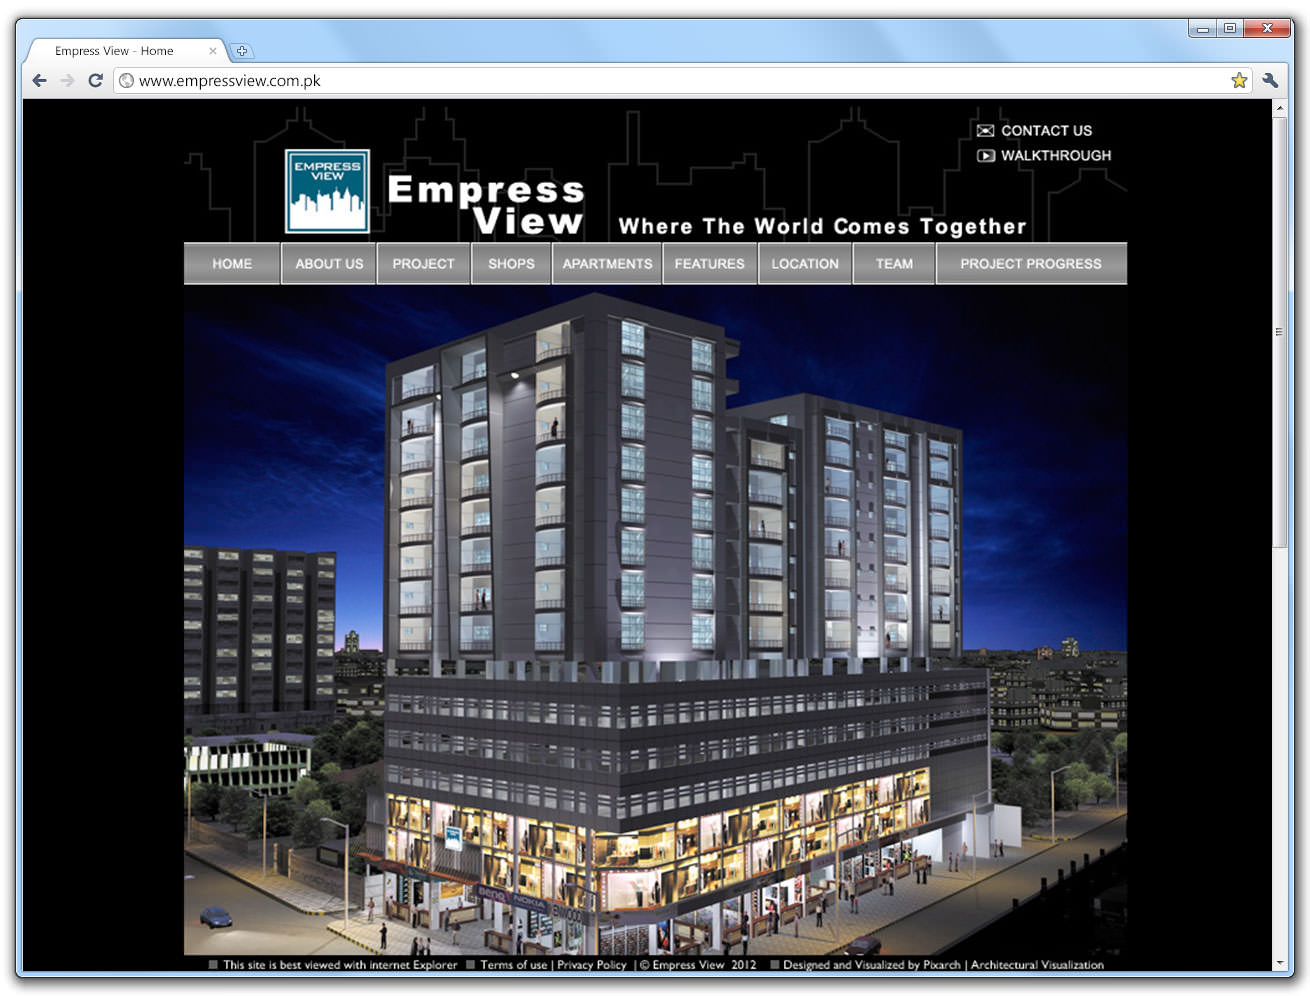 empress-view-website